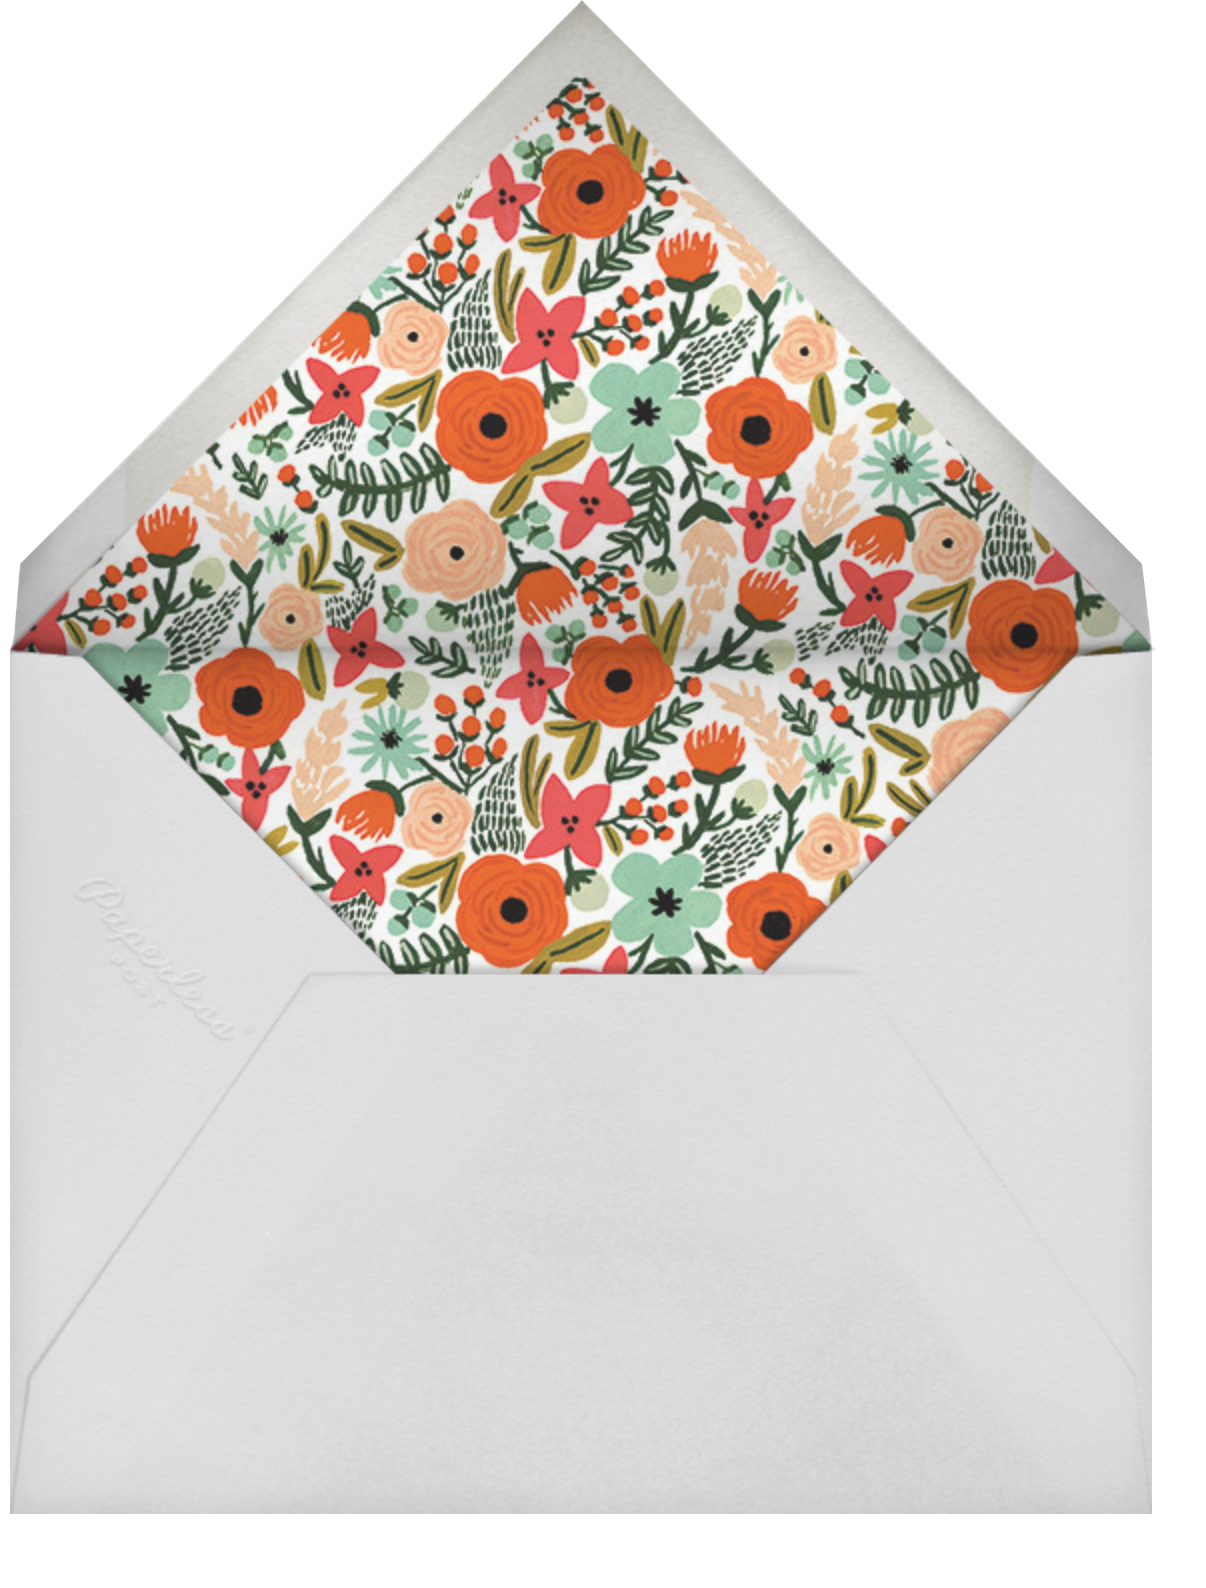 Floral Heart - Rifle Paper Co. - Engagement party - envelope back